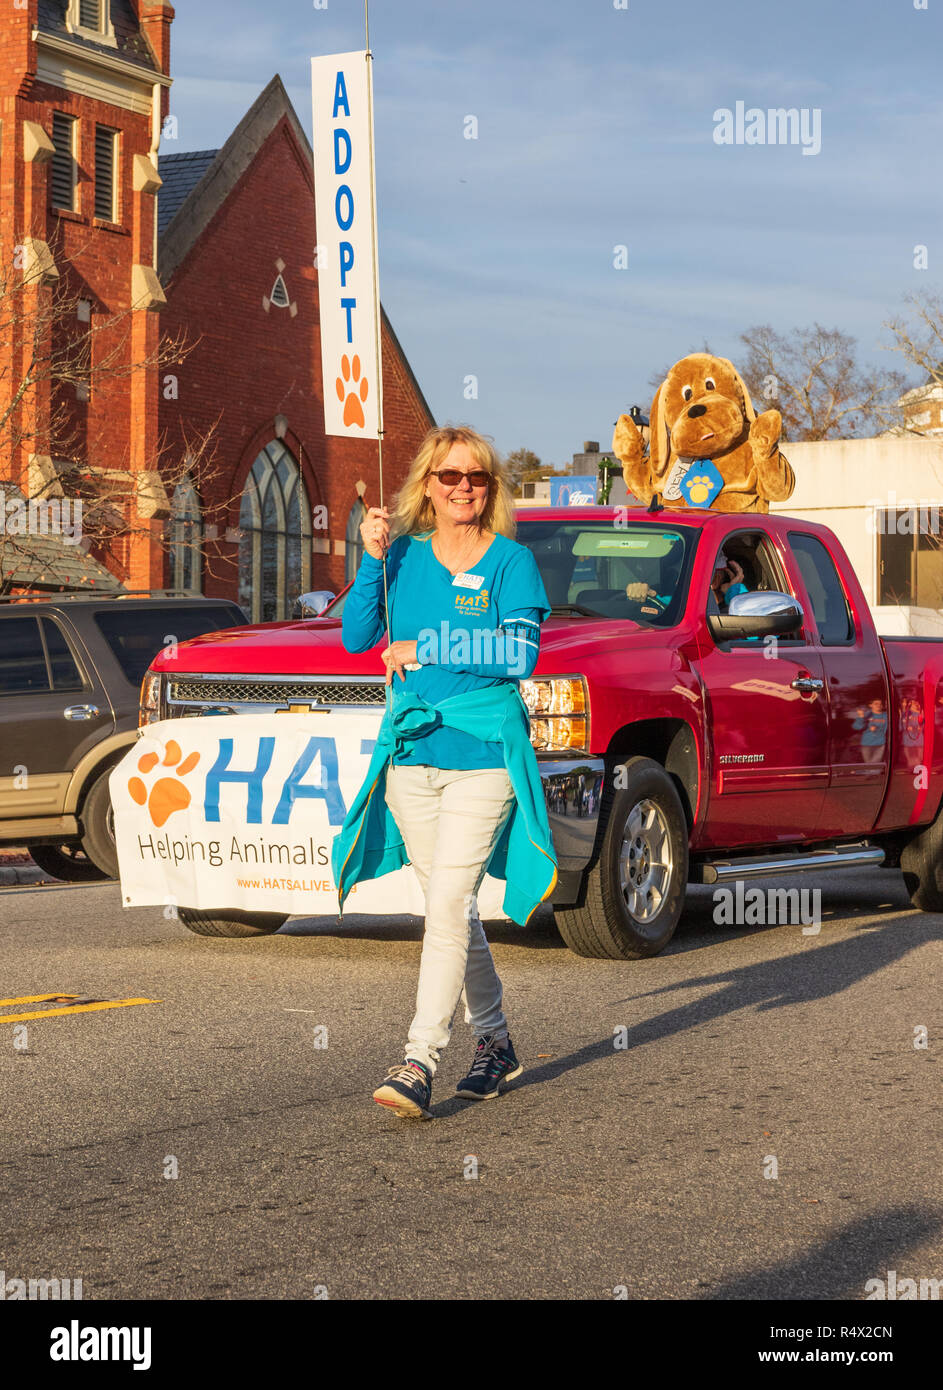 LINCOLNTON, NC, USA-11/25/18: An animal adoption organization in Christmas parade. - Stock Image